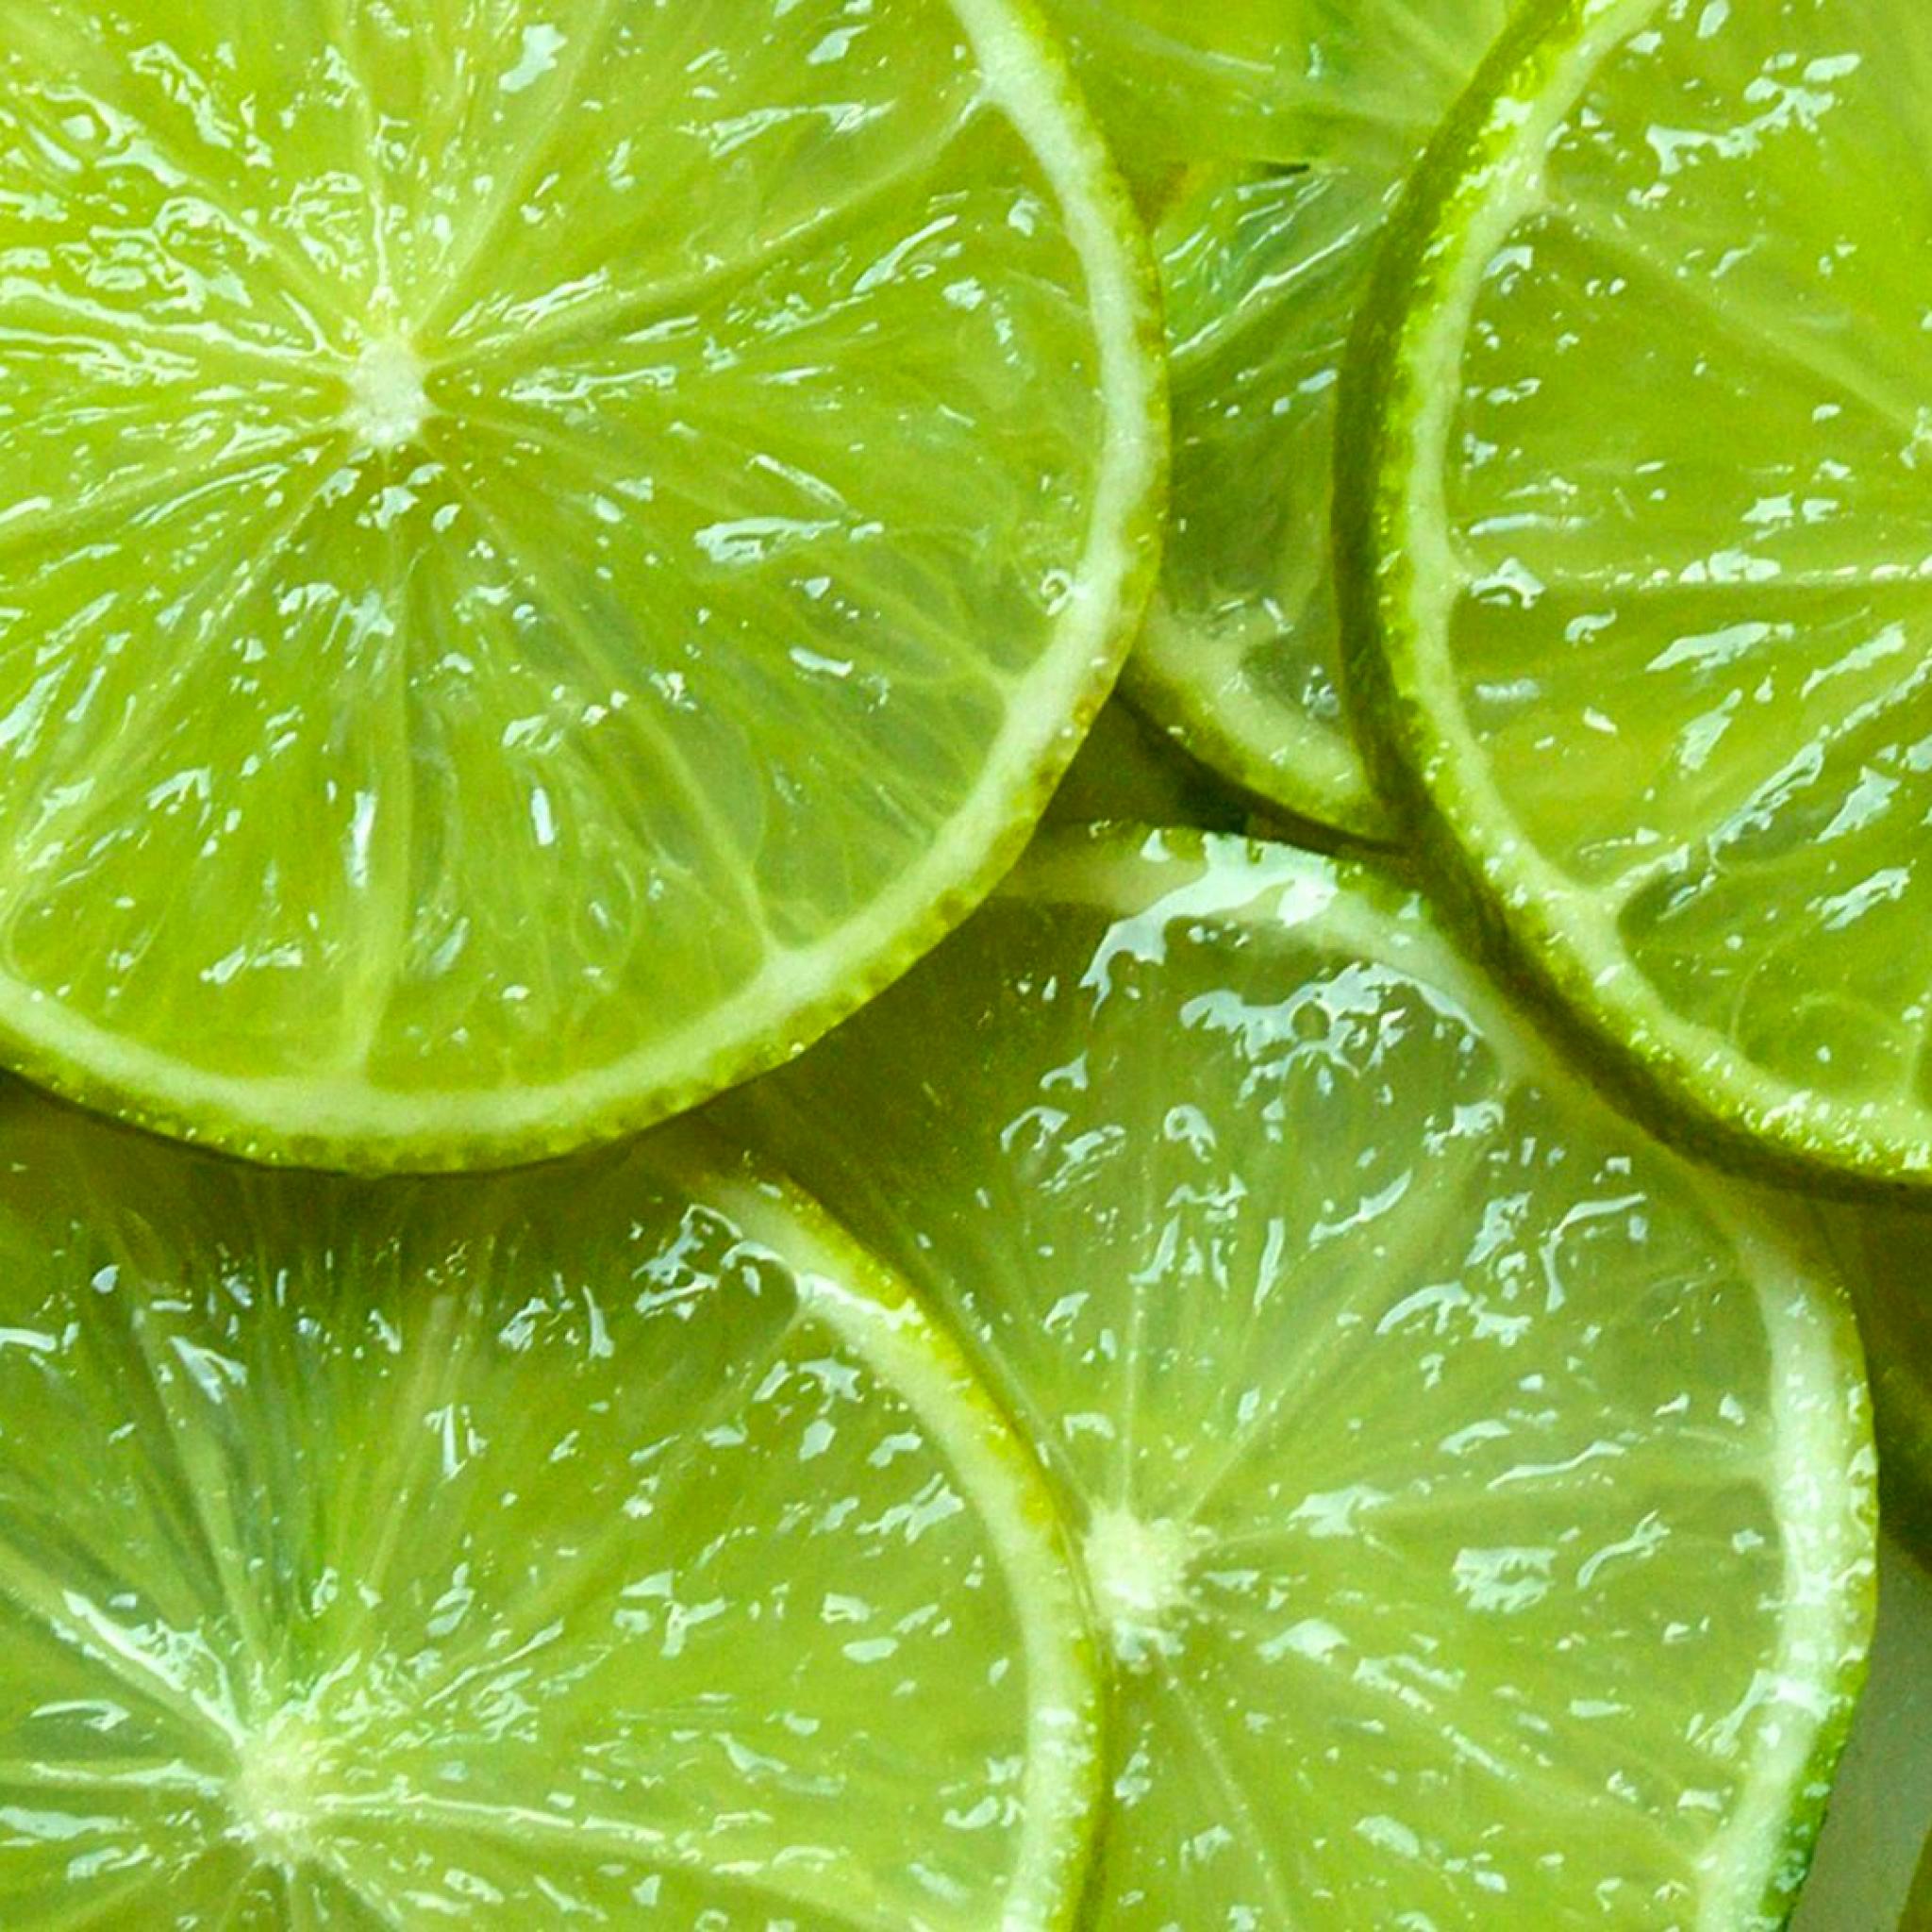 Green Limes 3Wallpapers iPad Retina Green Limes   iPad Retina